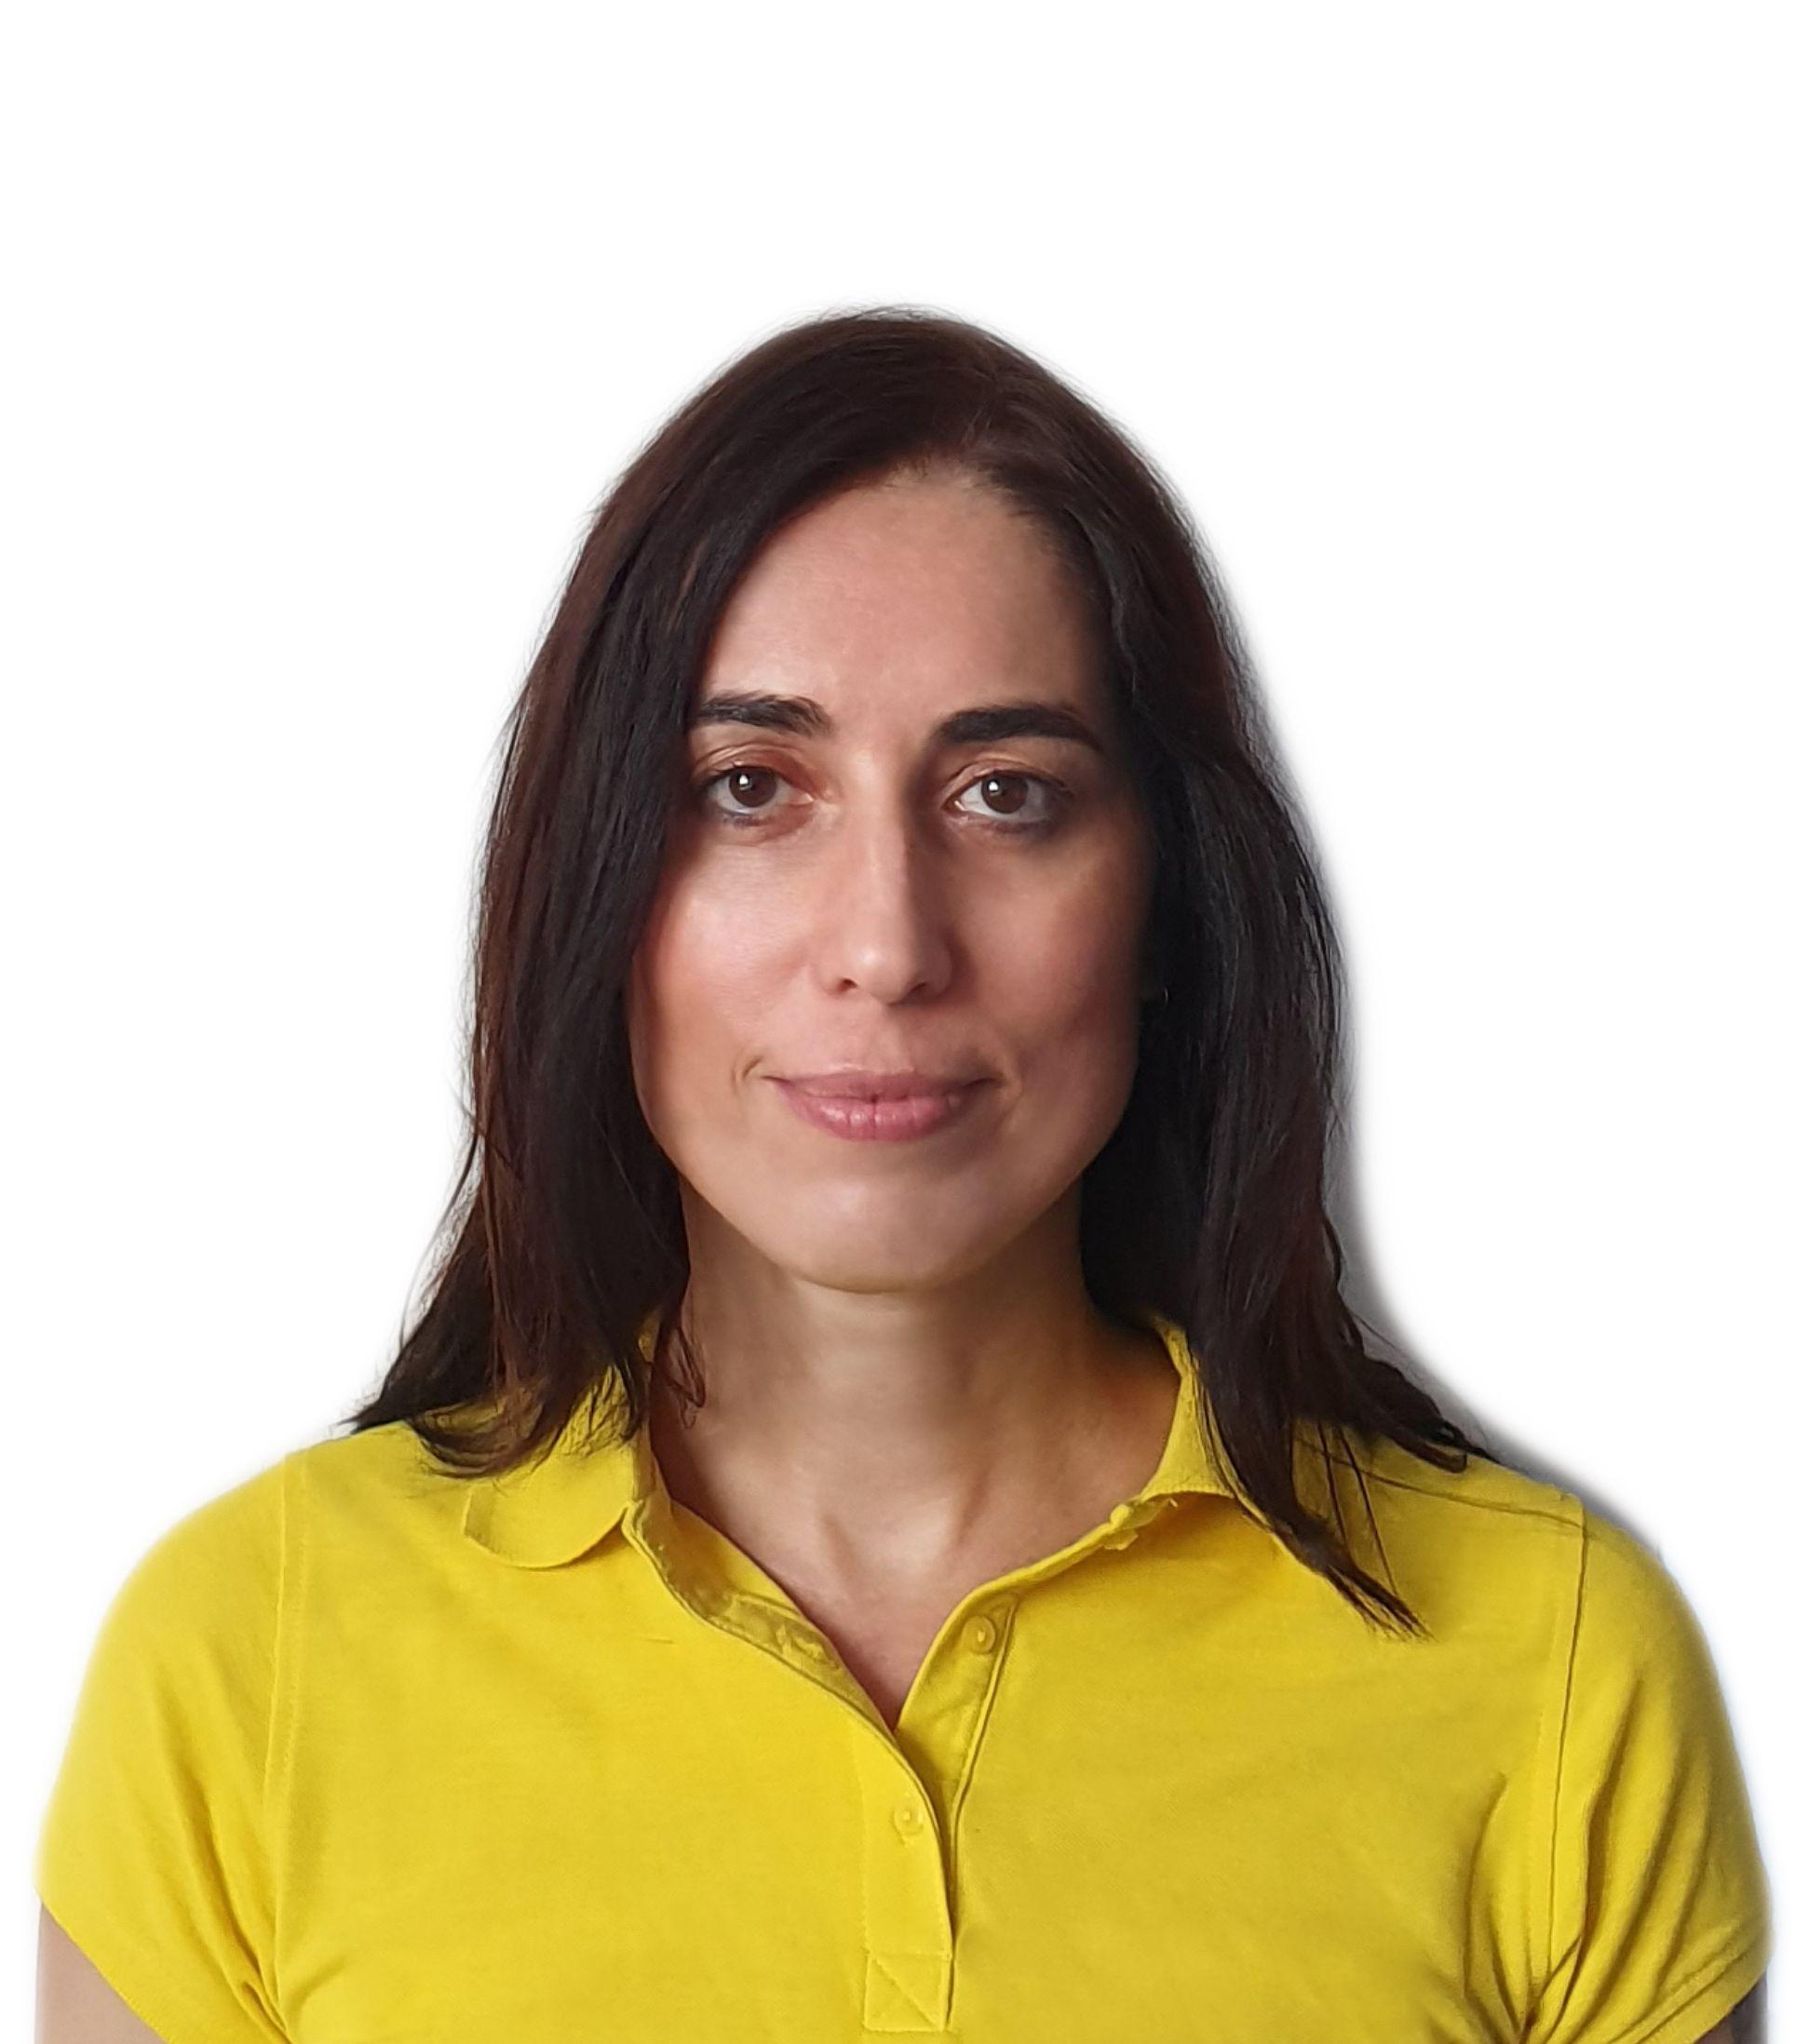 Janka Lukačovičová